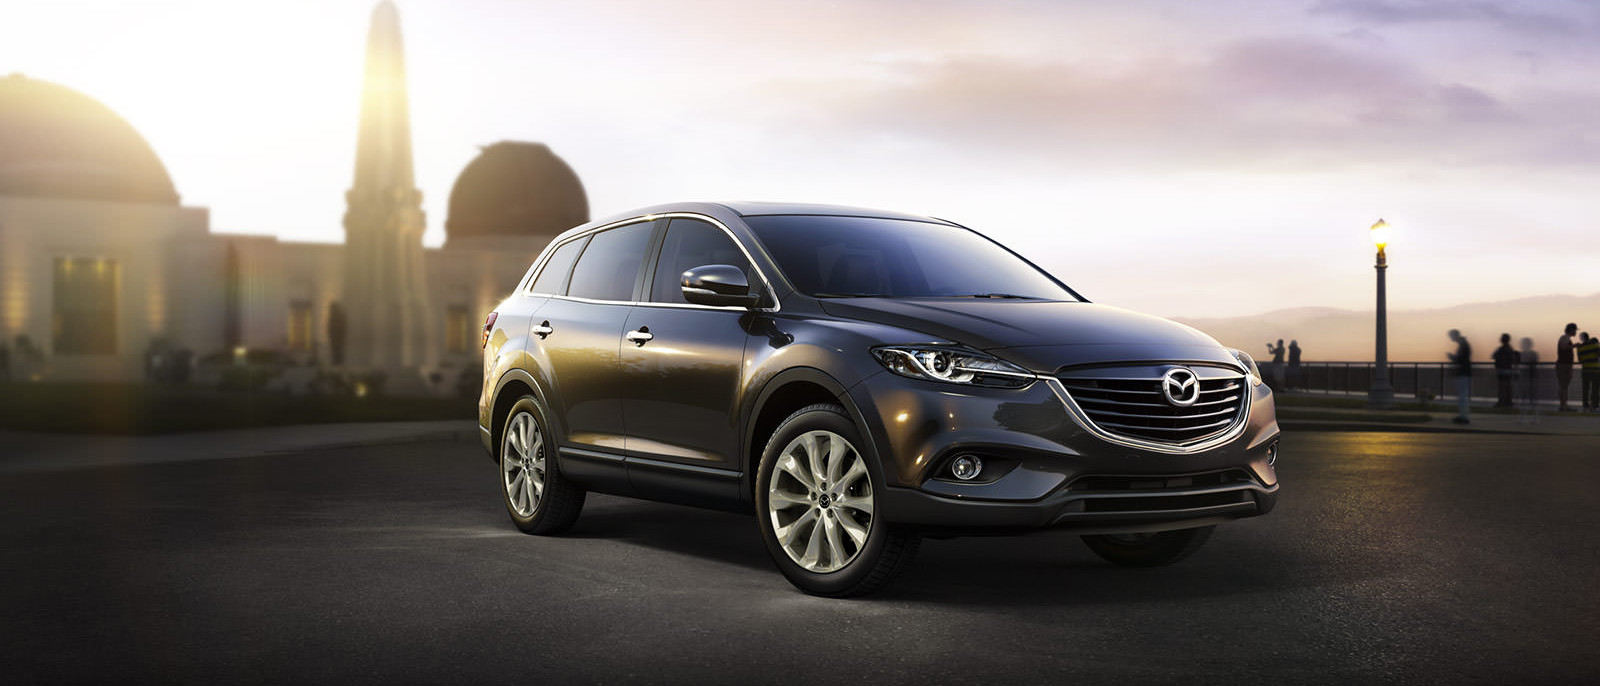 2015 Mazda Cx-9 exterior